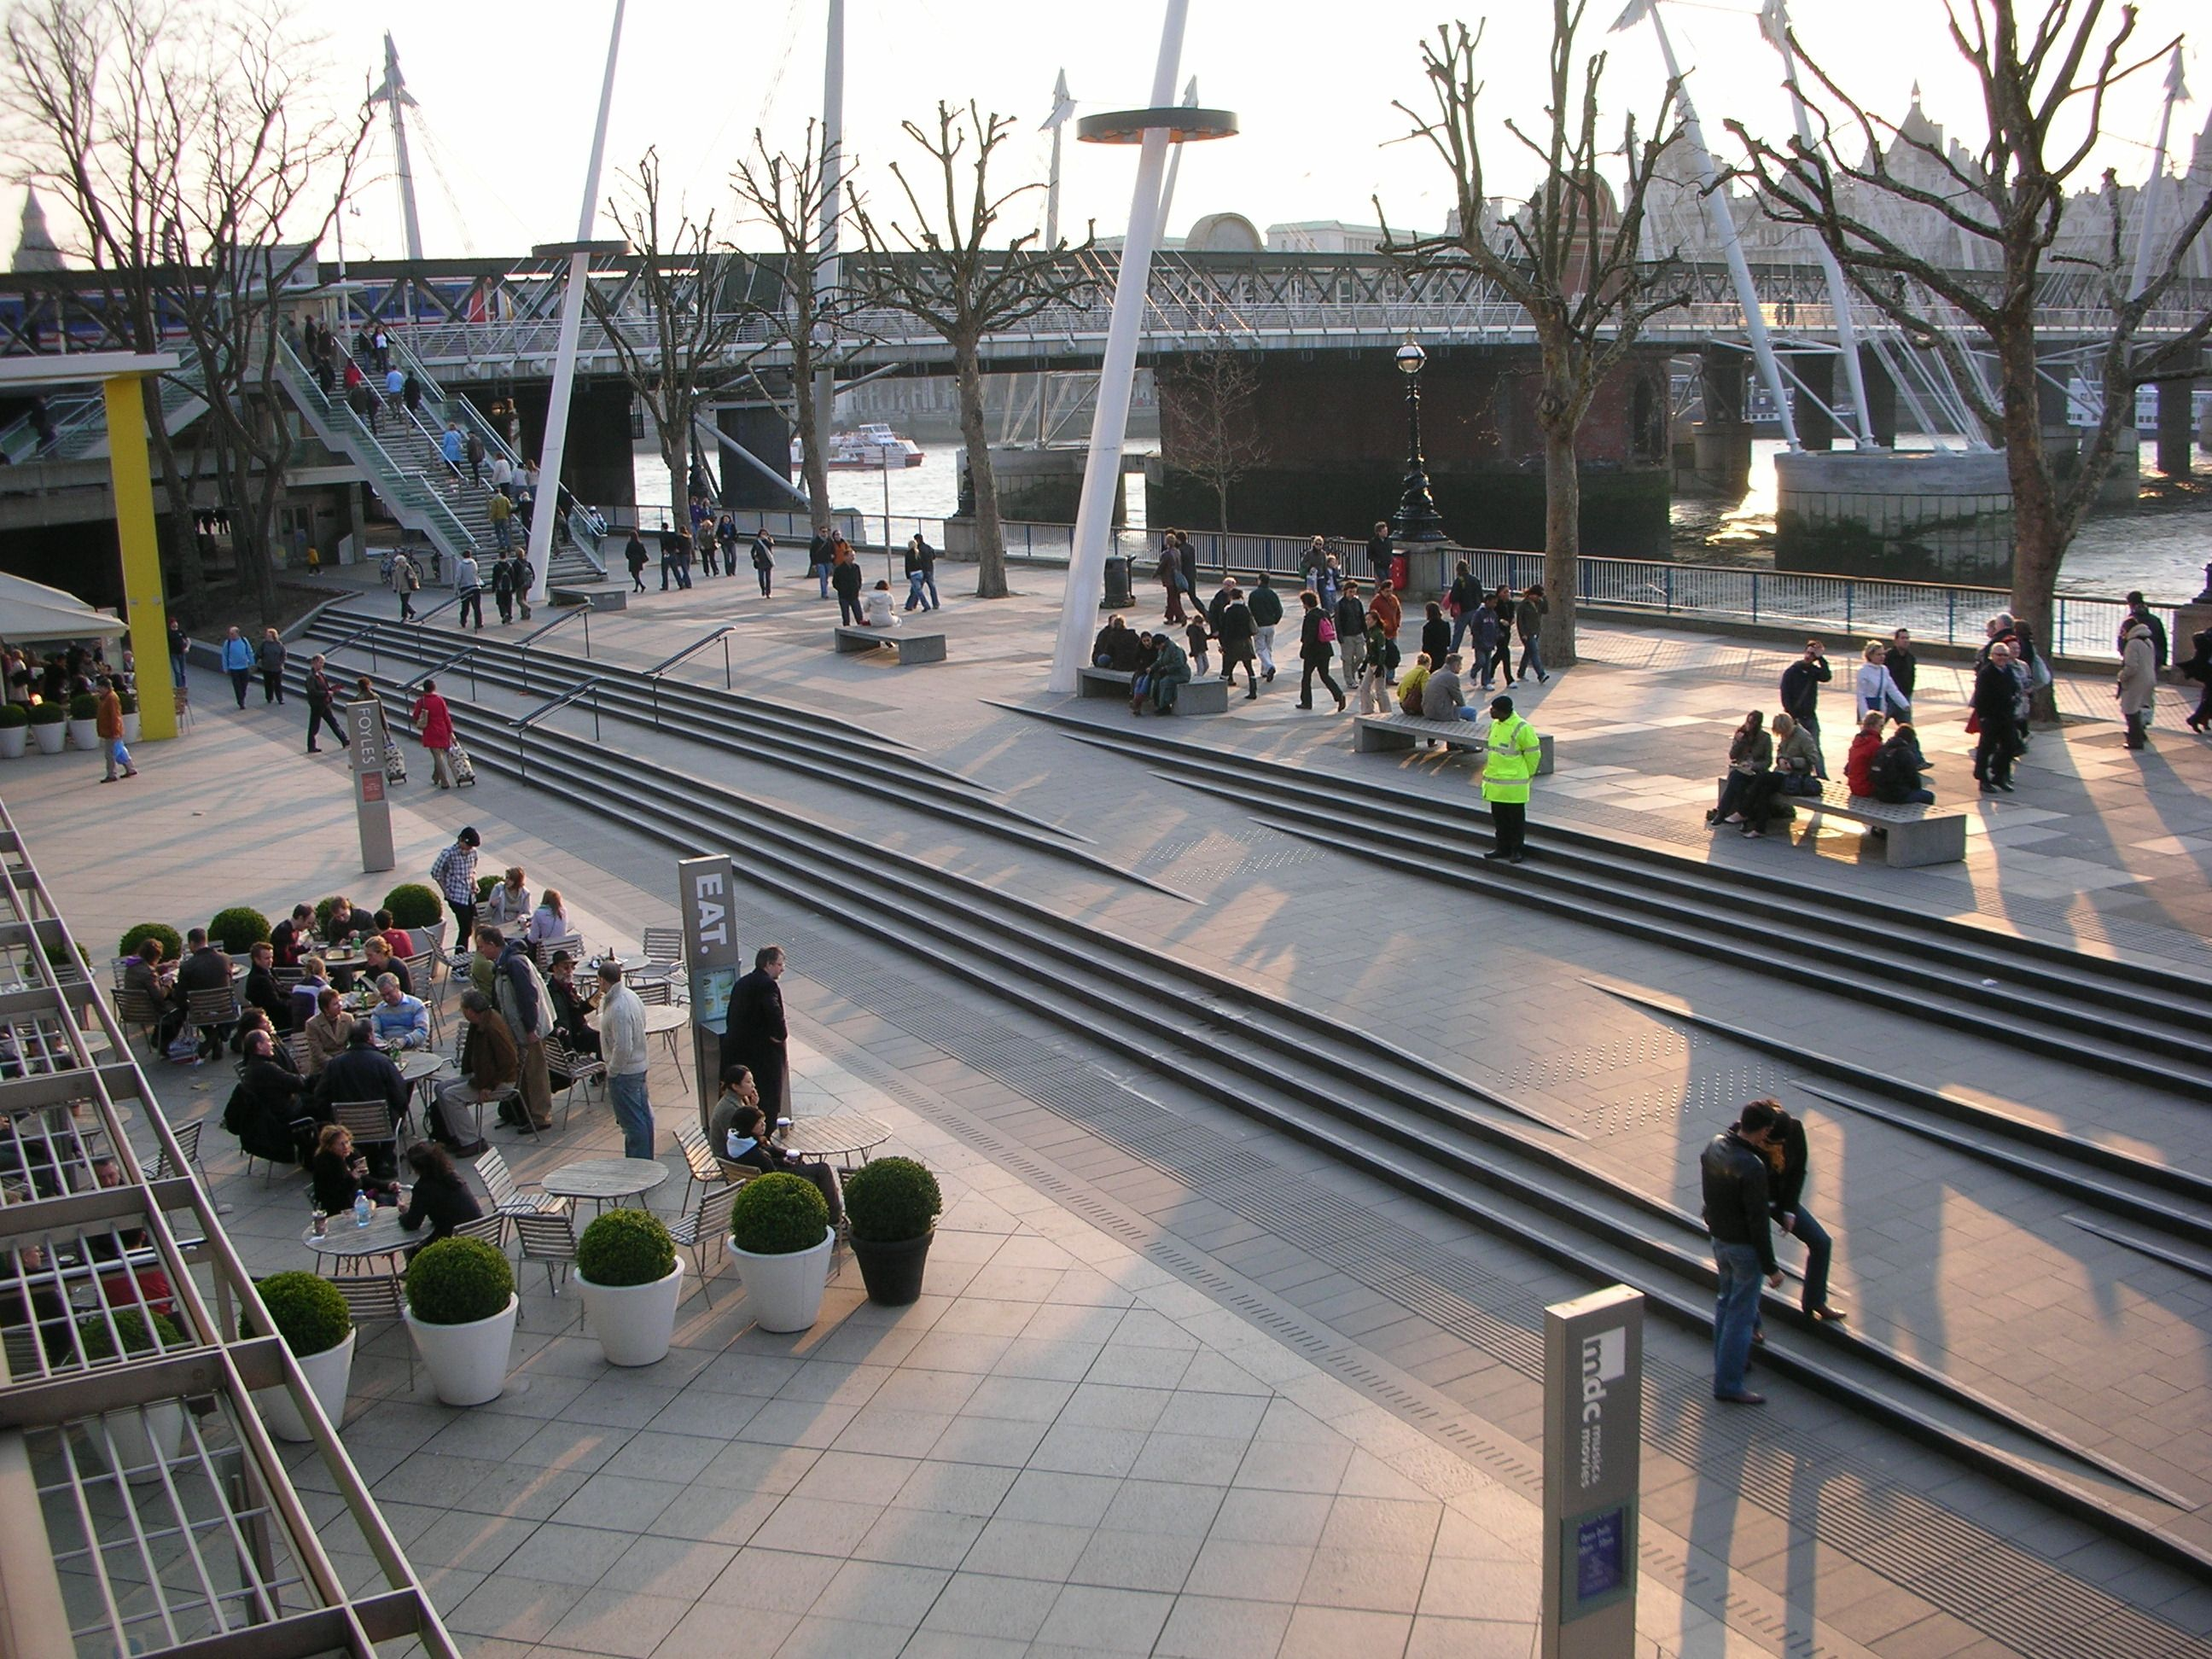 Southbank royal festival hall landscape steps and ramp